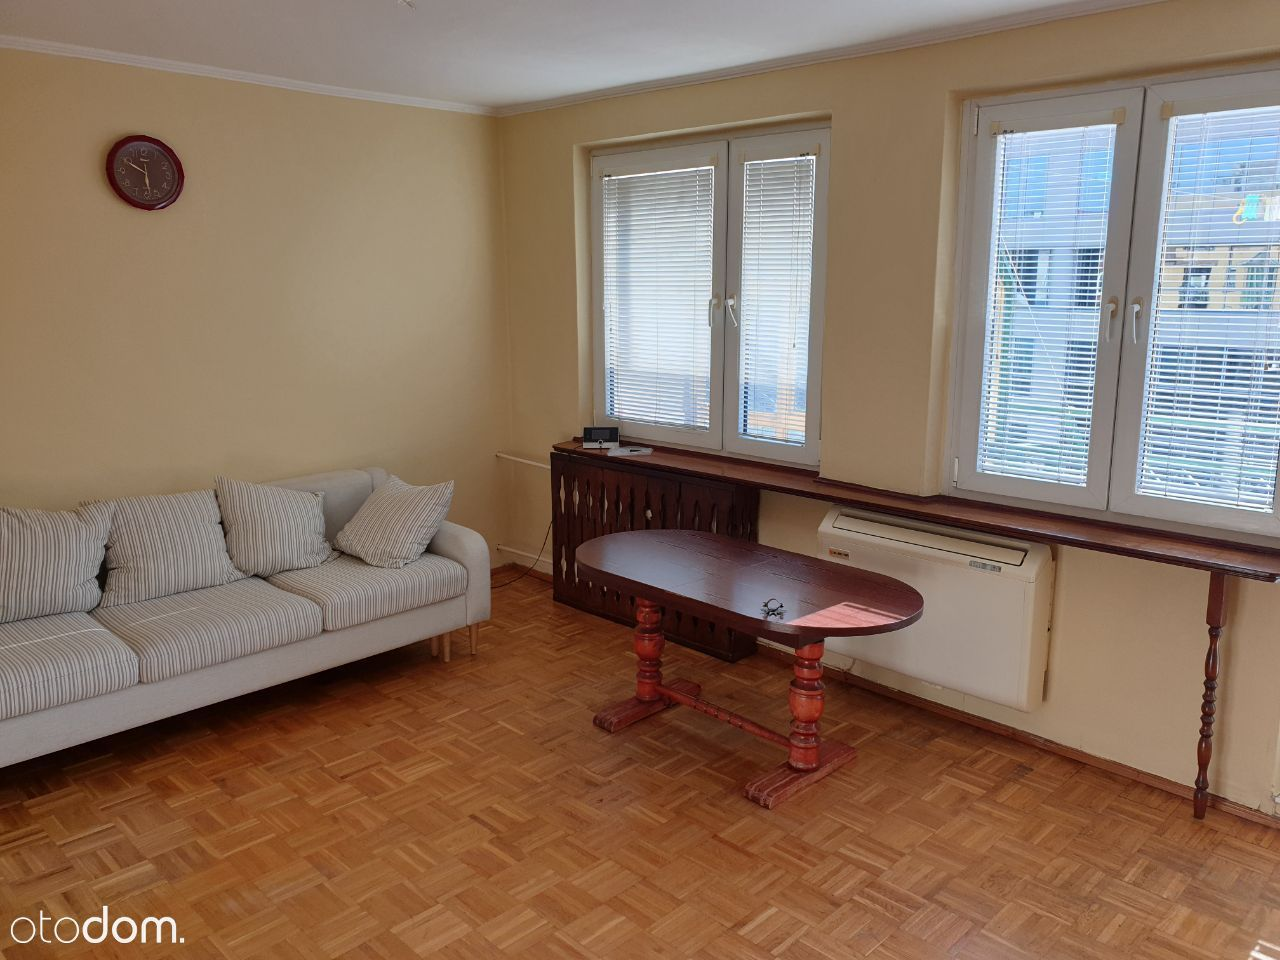 Mieszkanie w CENTRUM ul BEMA